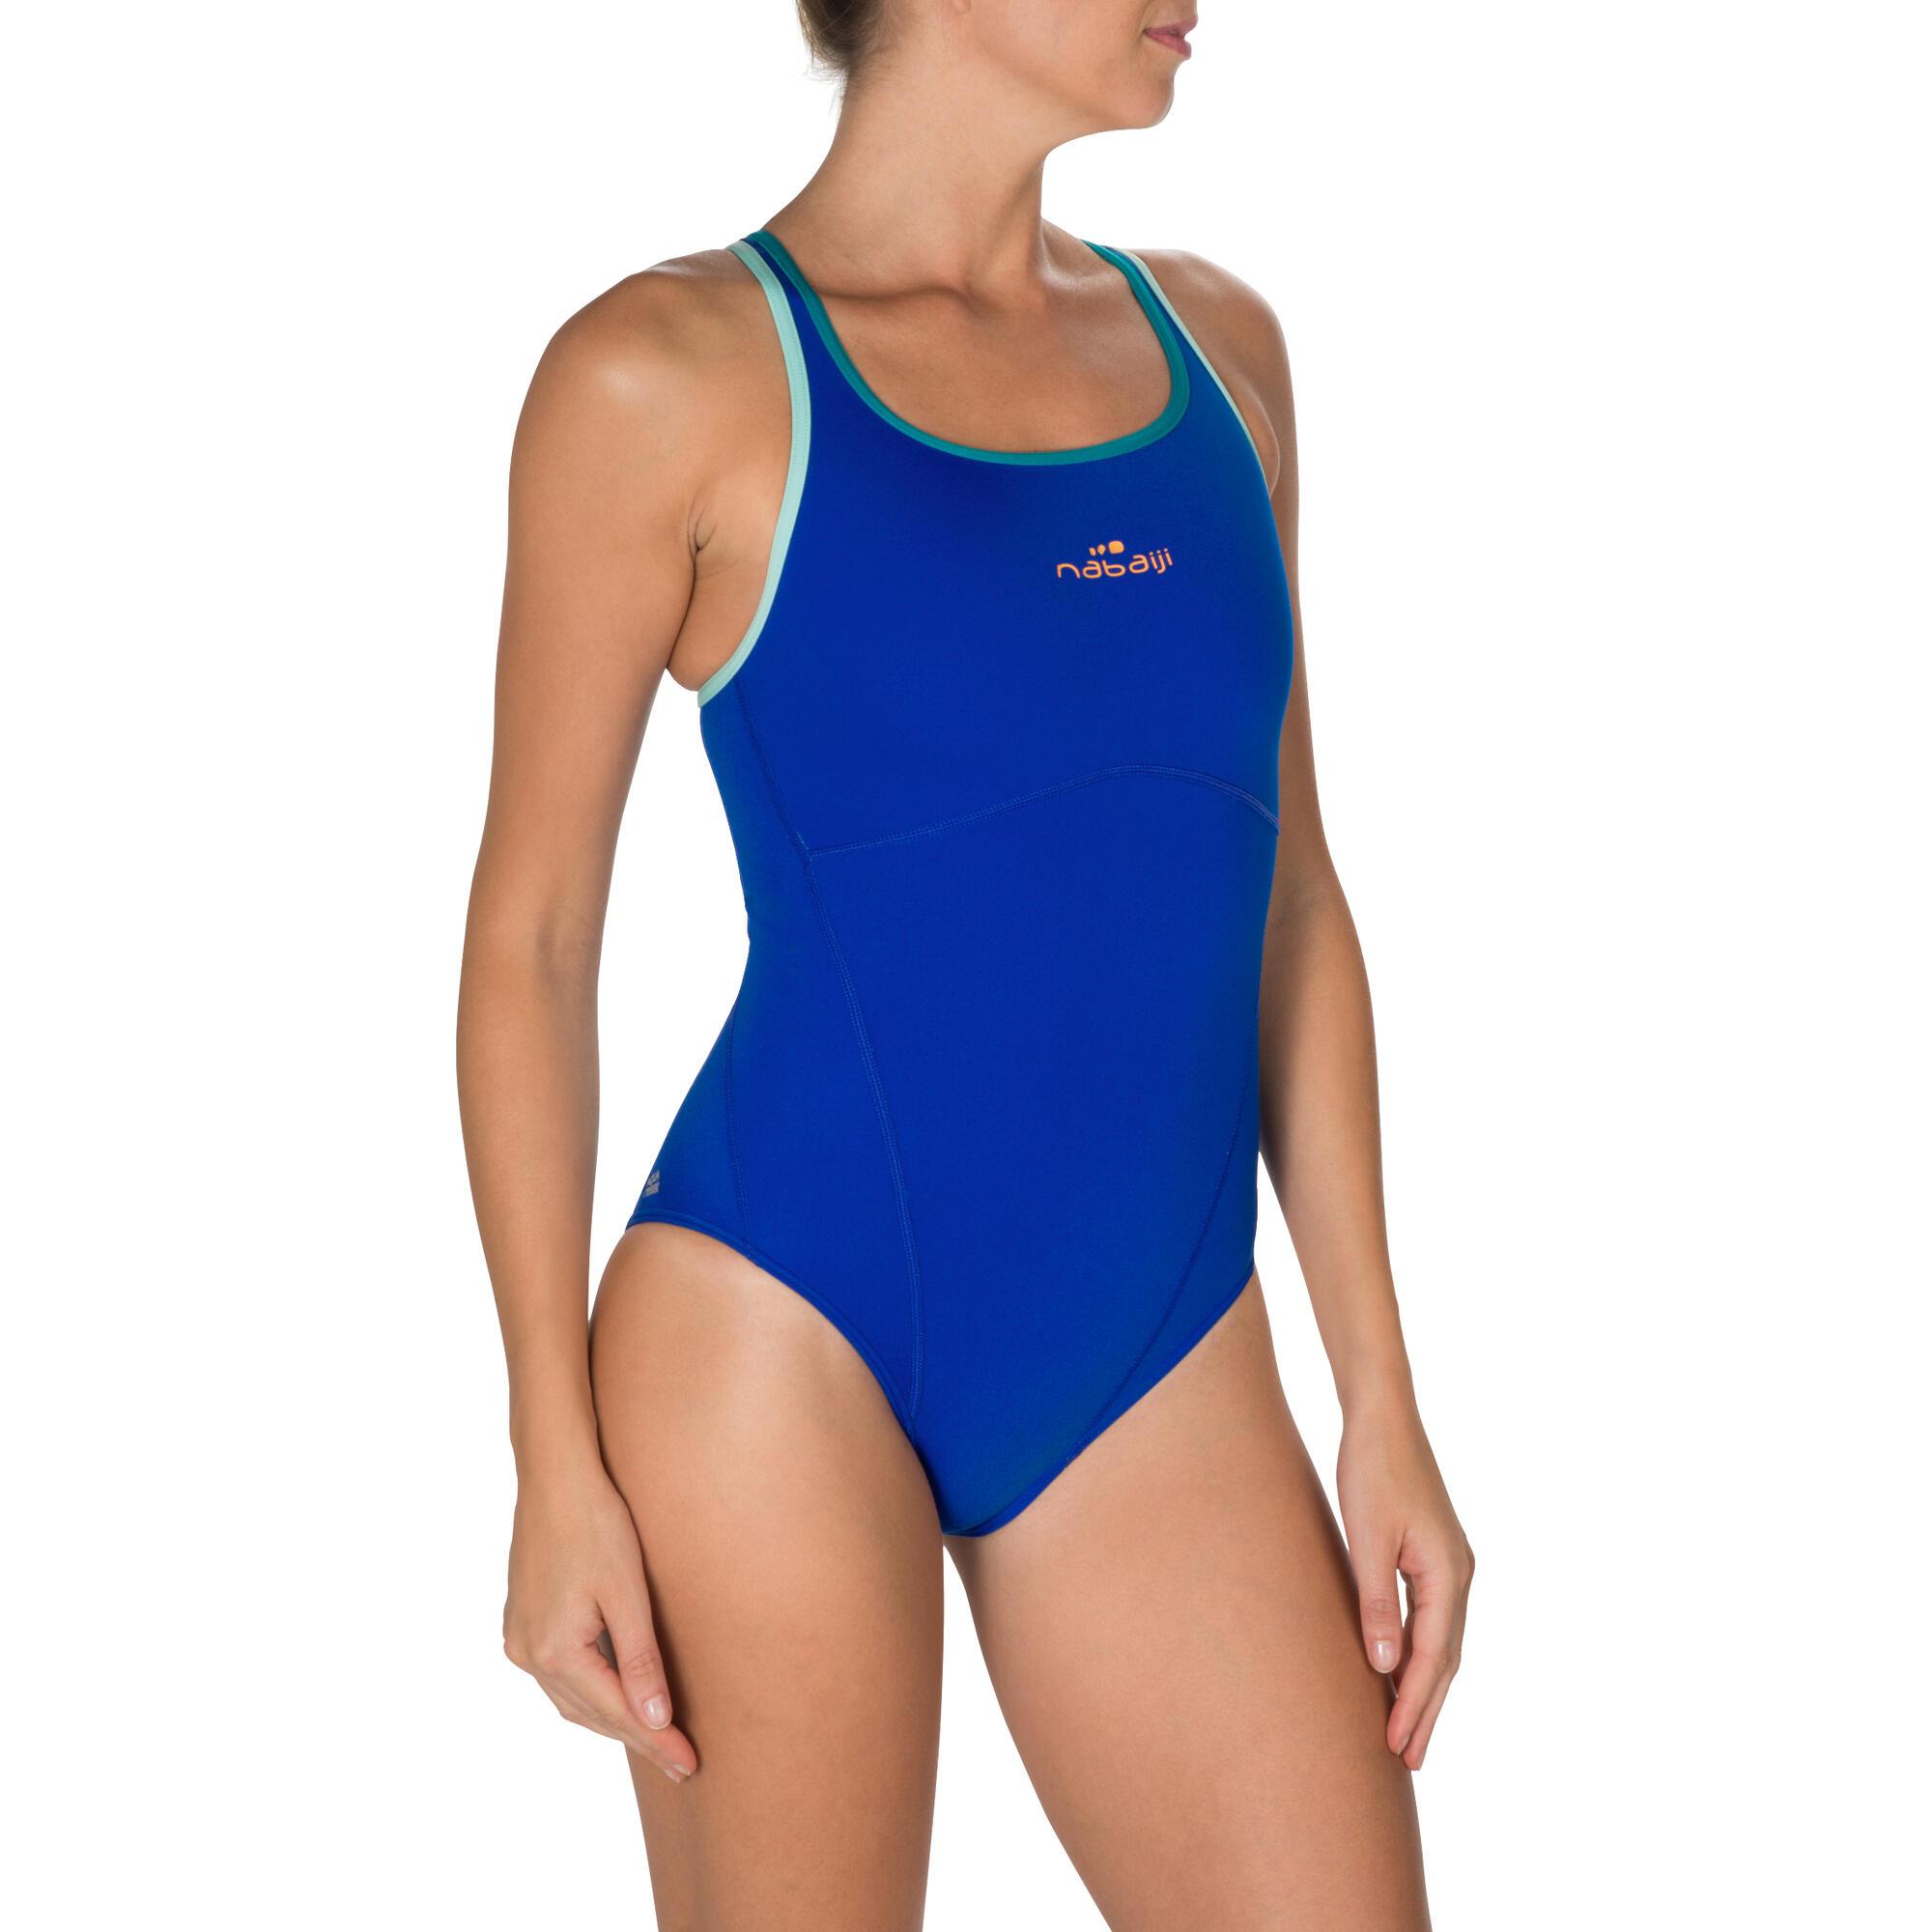 kamiye women 39 s chlorine resistant one piece swimsuit blue nabaiji. Black Bedroom Furniture Sets. Home Design Ideas